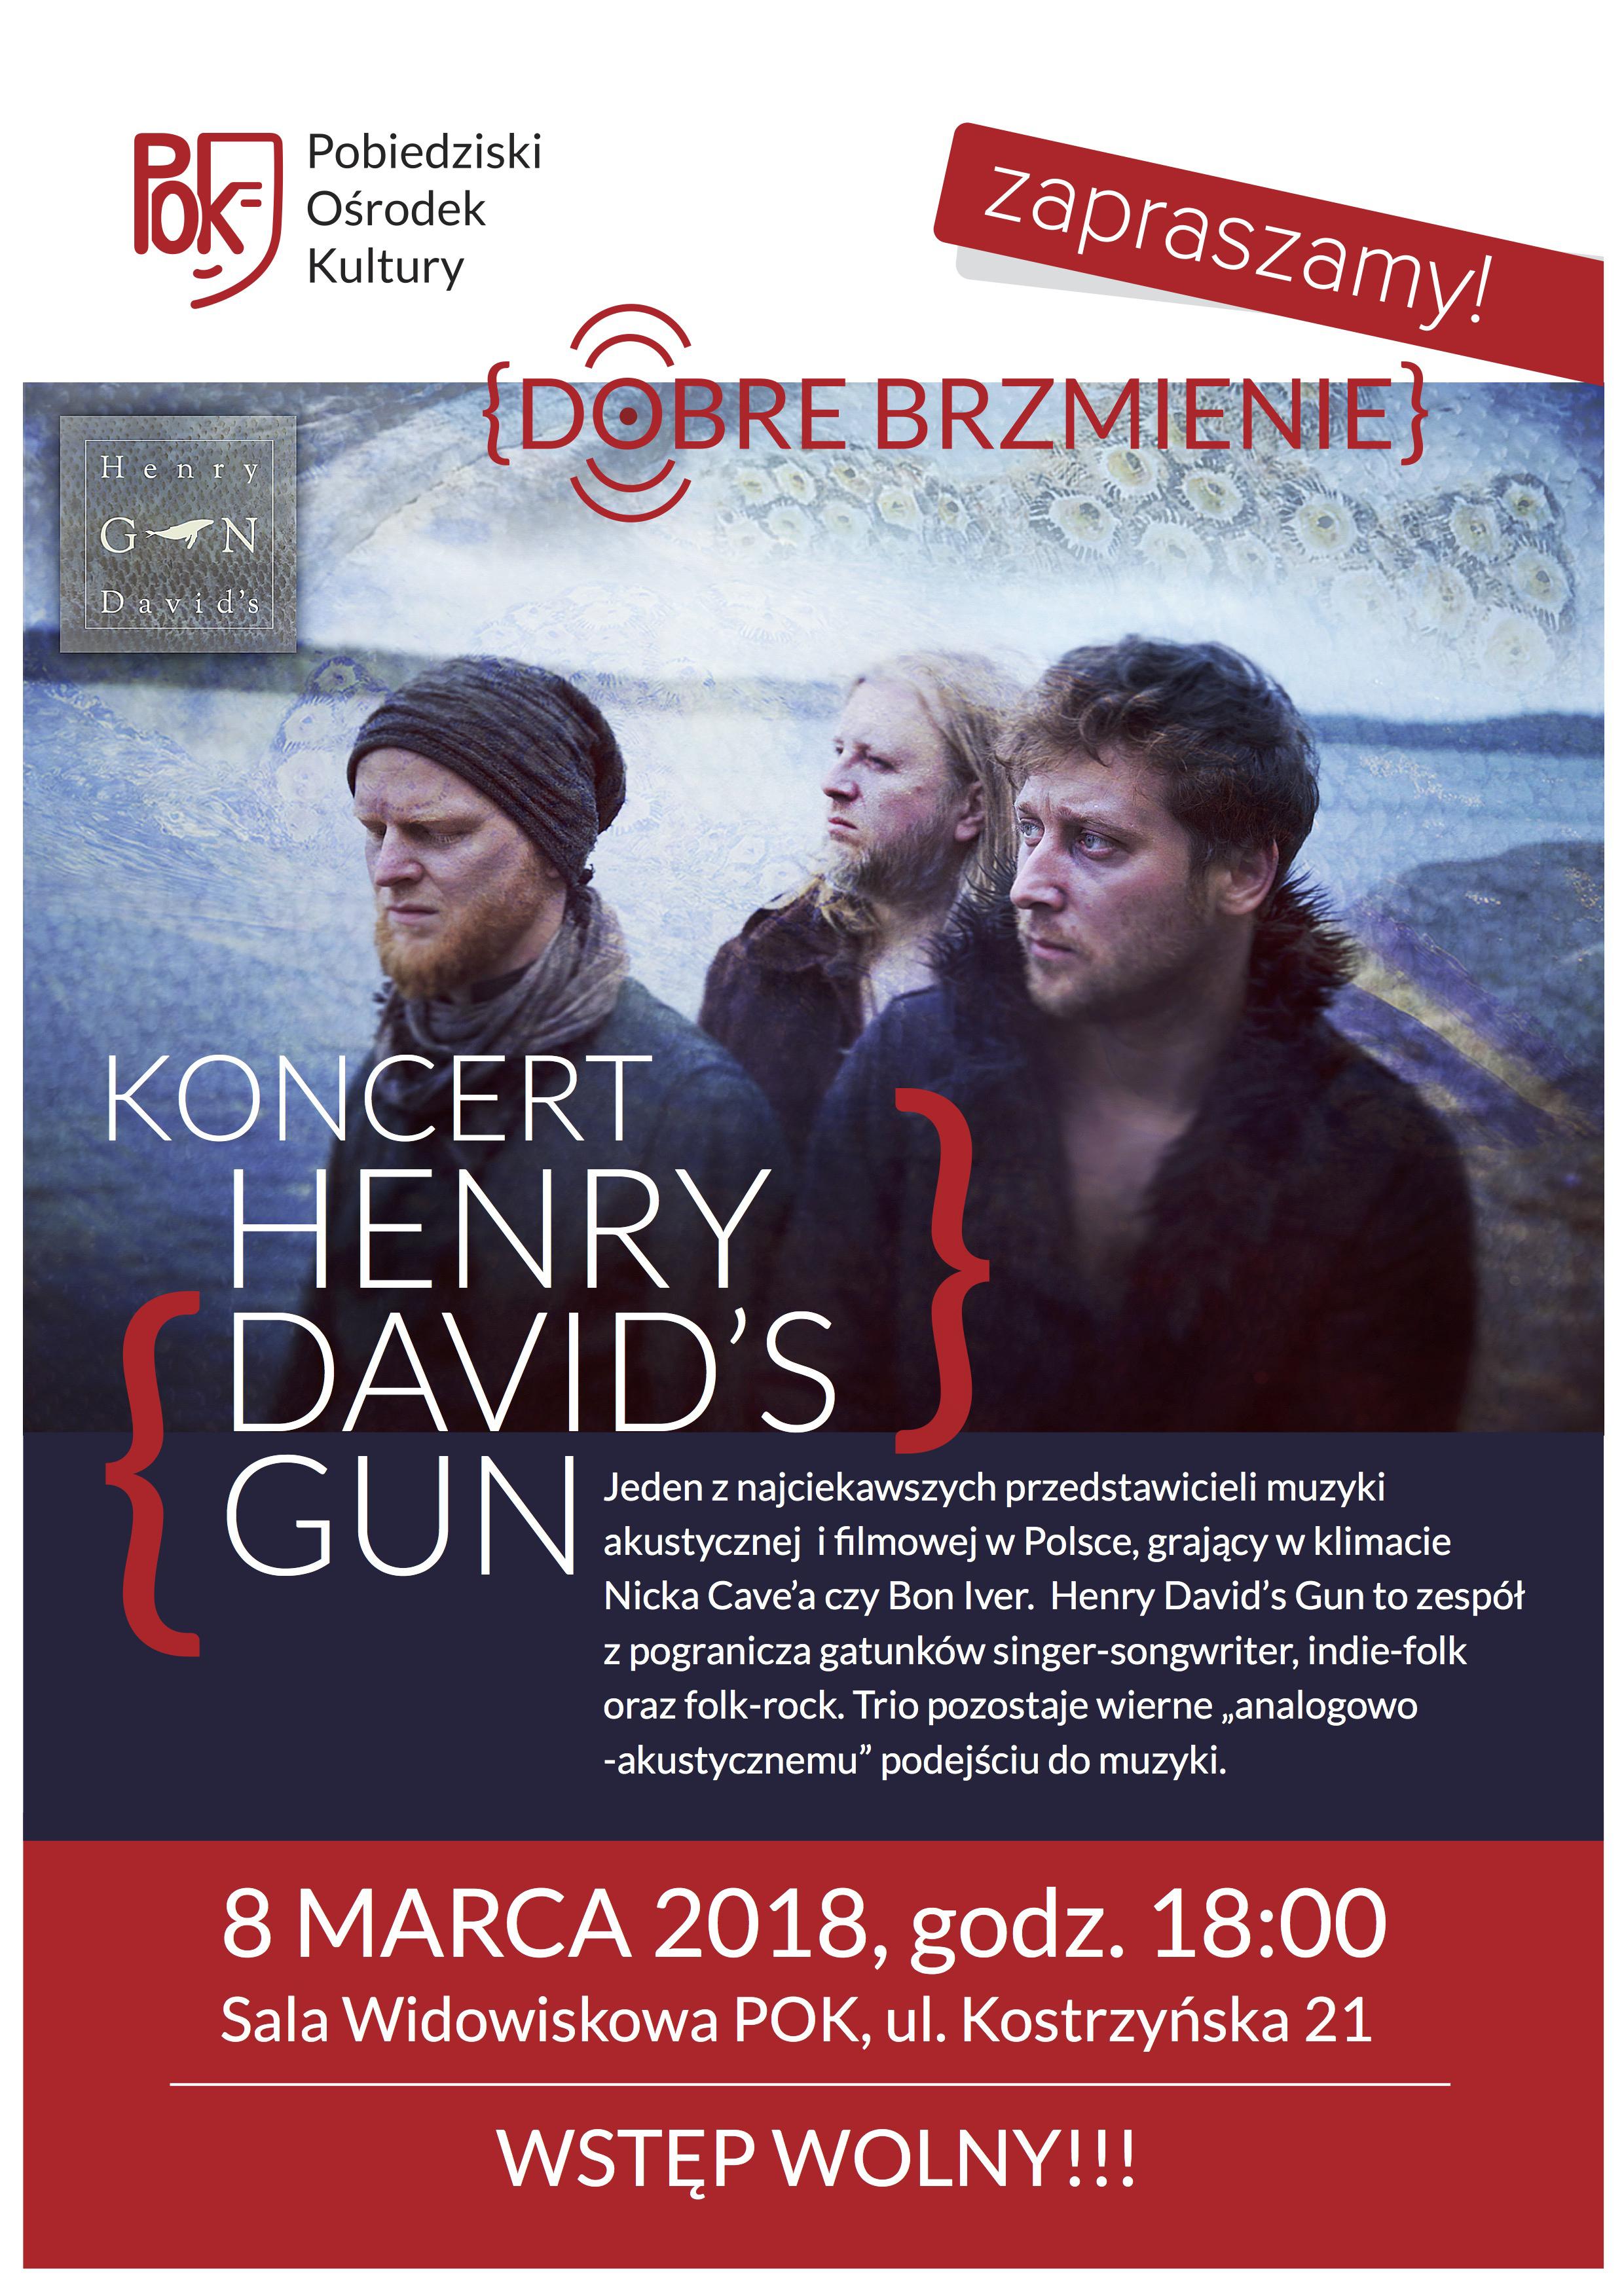 HENRY DAVID'S GUN KONCERT PLAKAT